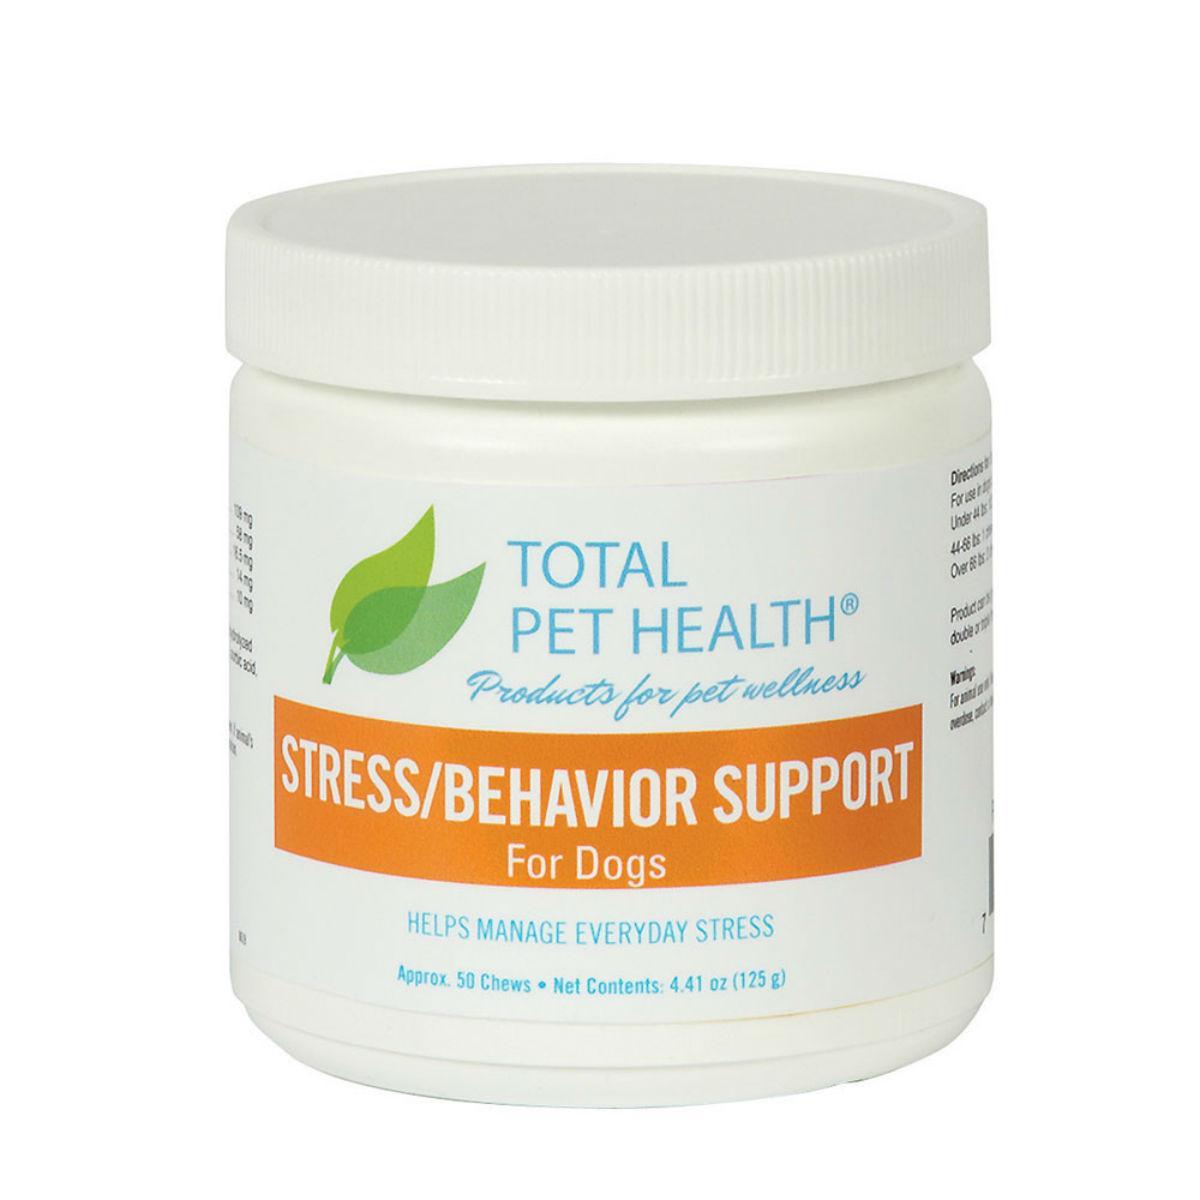 Total Pet Health Stress/Behaviour Support Dog Chews